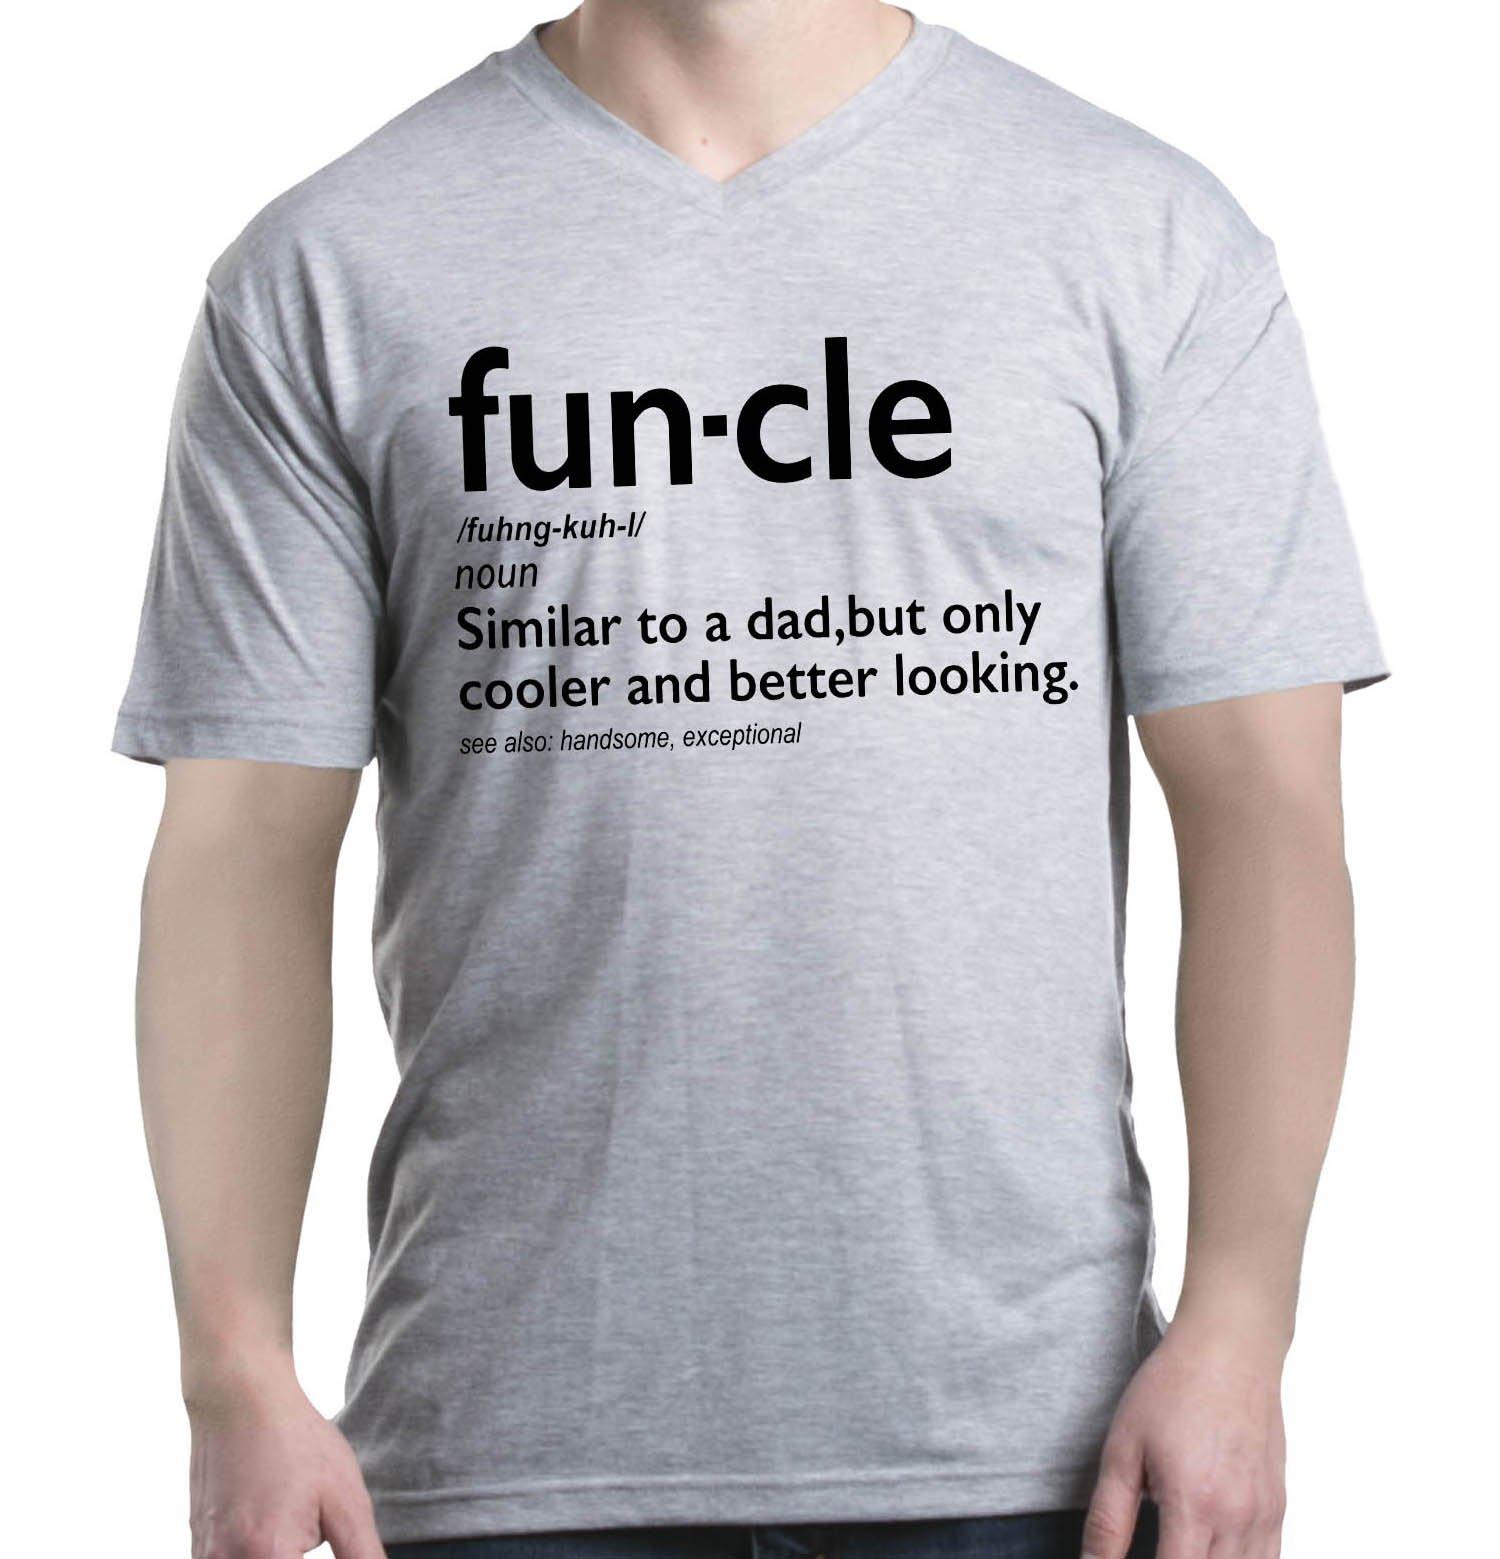 Fun Cle T Shirt Uncle Shirts 4088